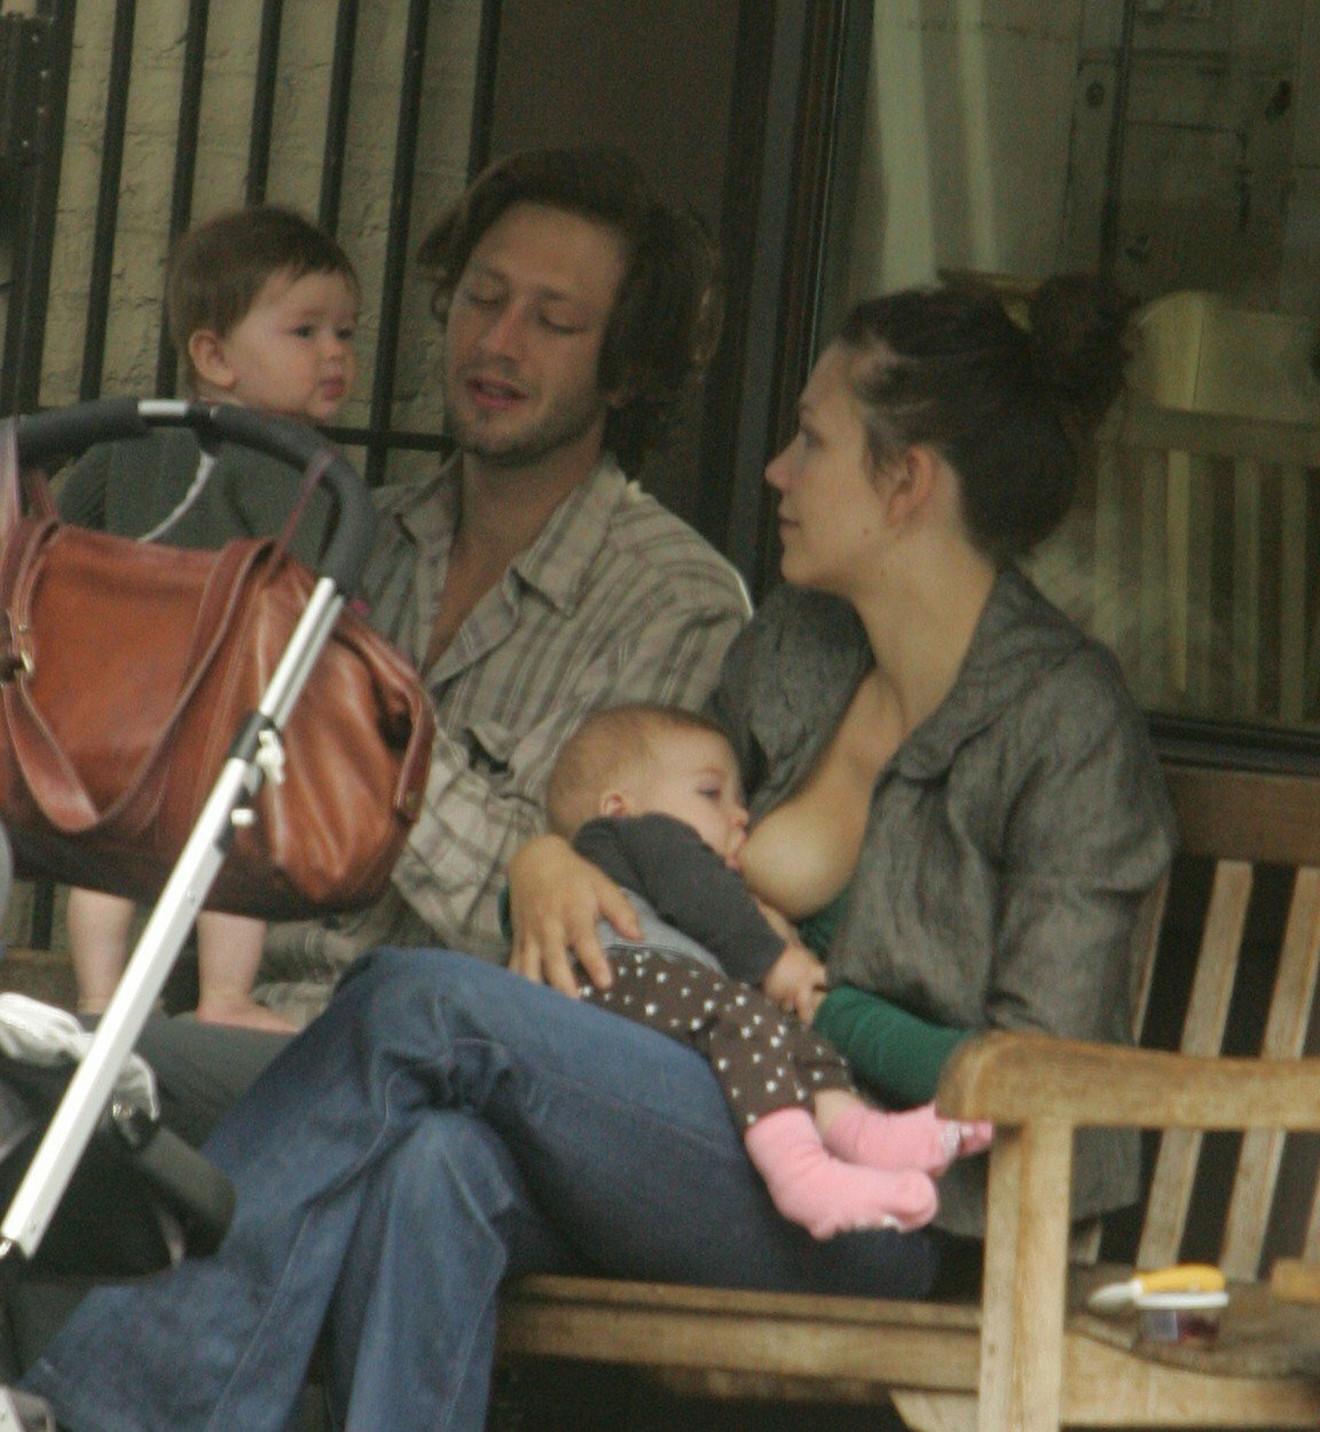 Glumica Megi Džilenhol svoju ćerku Ramonu je dojila gde god se zatekla